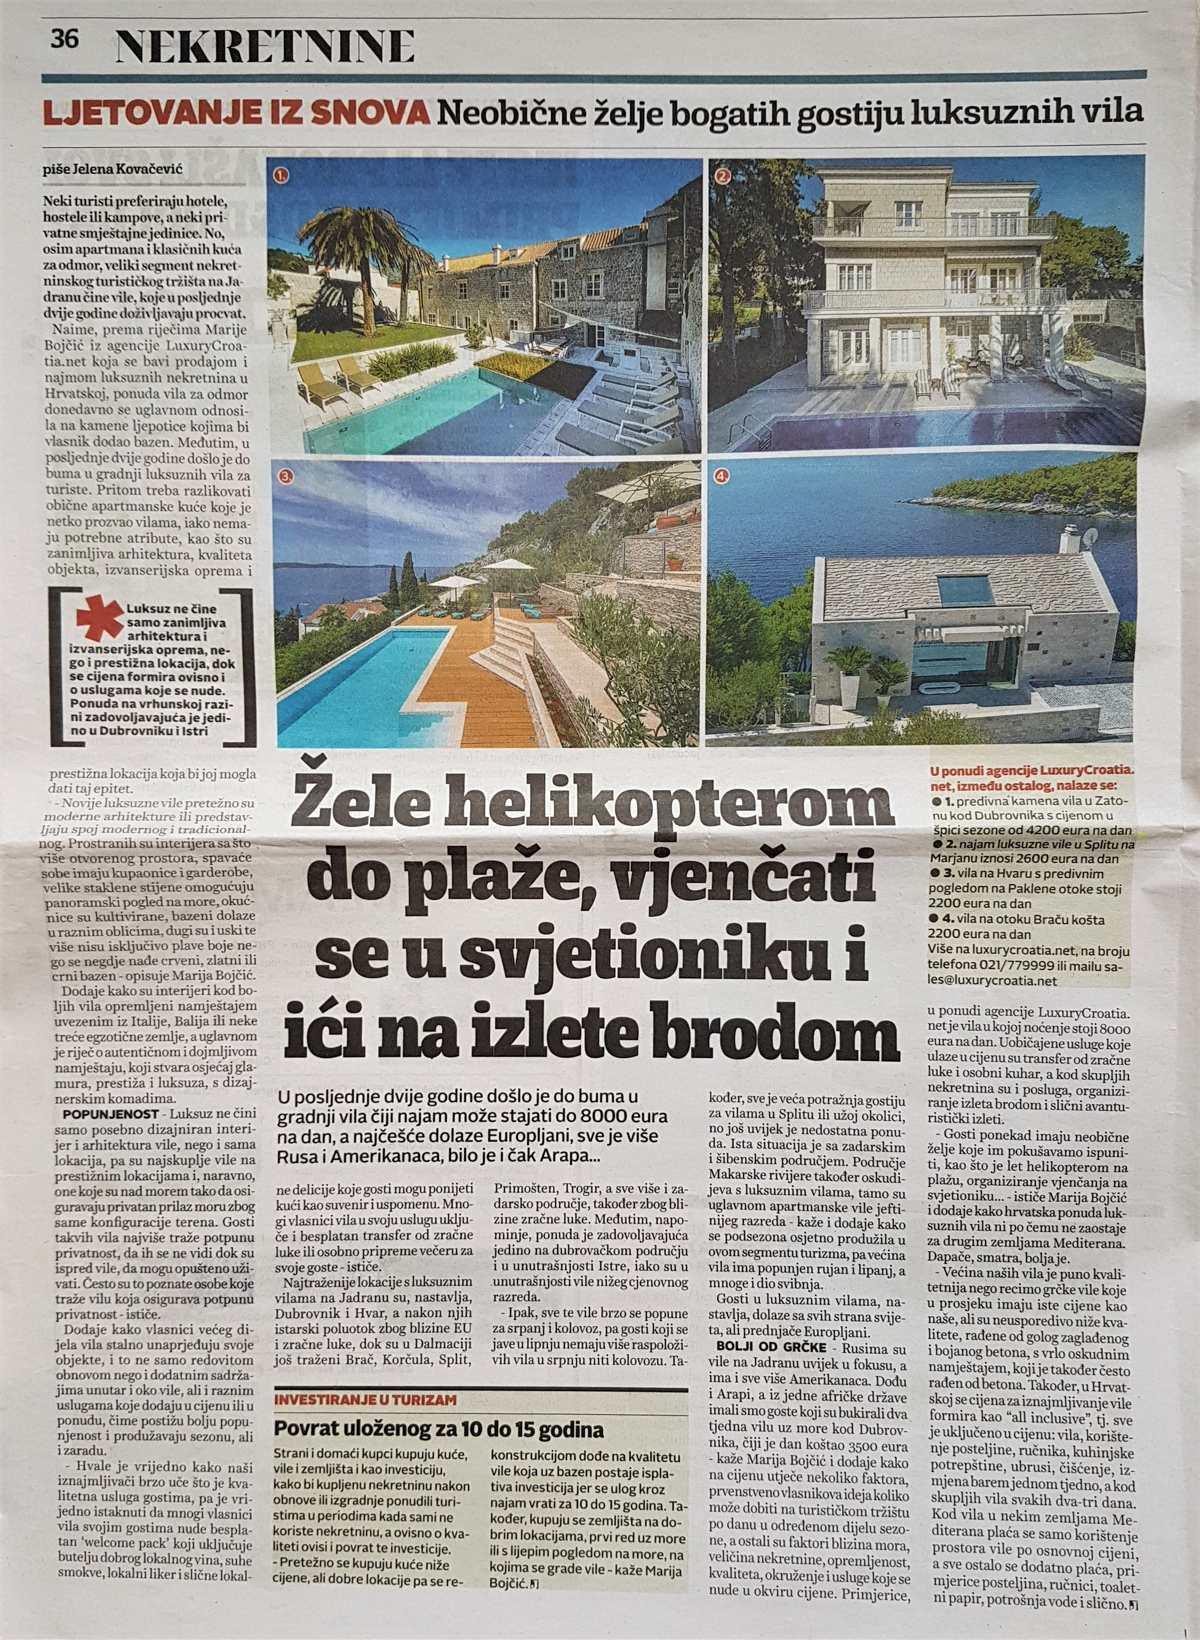 Interview about tourism with Marija Bojcic, National daily newspaper Jutarnji, Real Estate, August 2017.